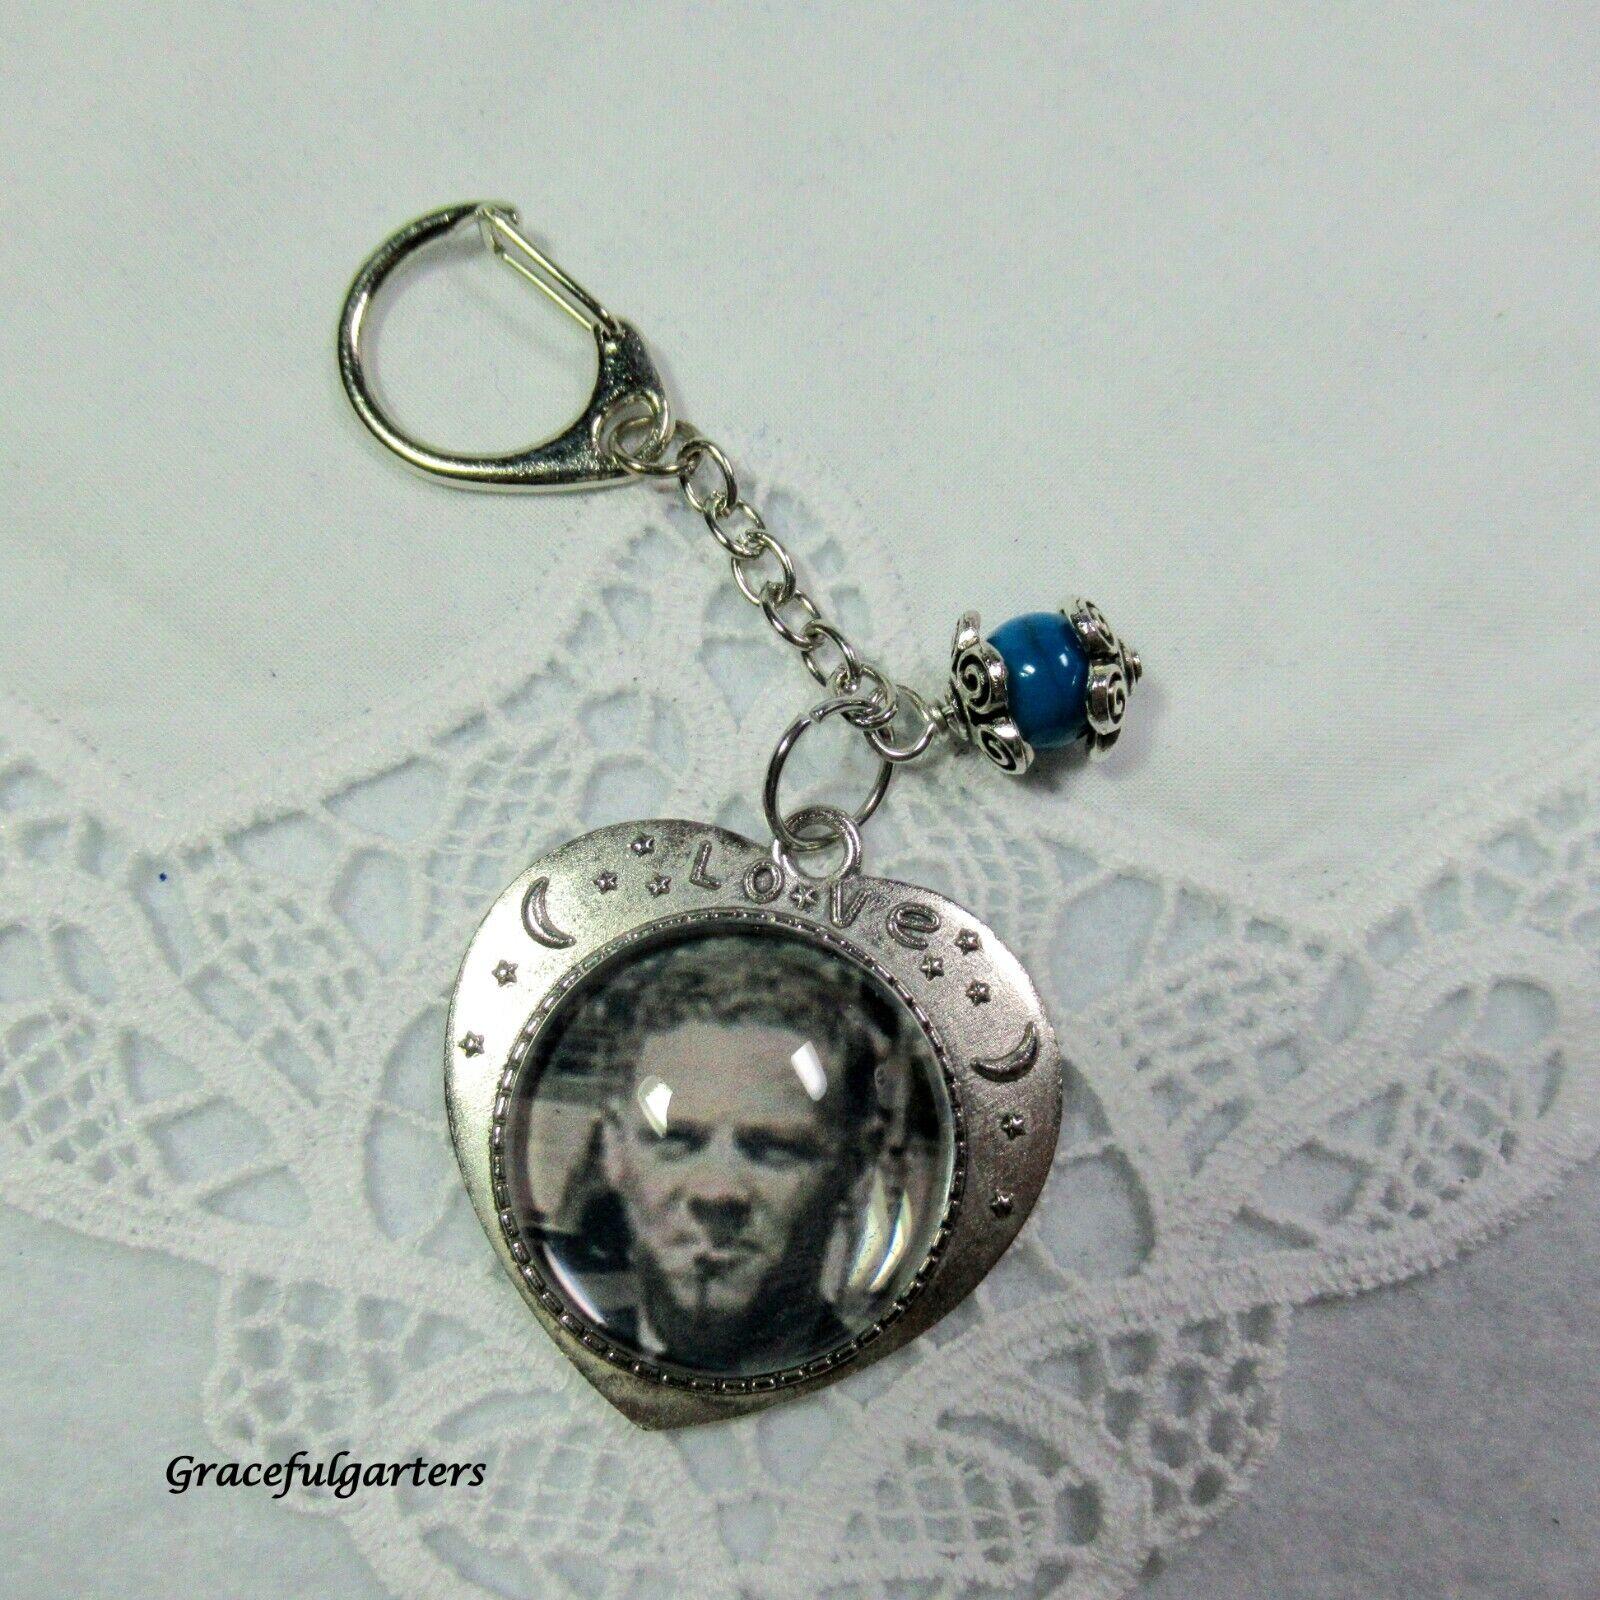 Memory Photo Charm Keyring/Bridal Photo Bouquet pin/Boutonniere Charm pin.